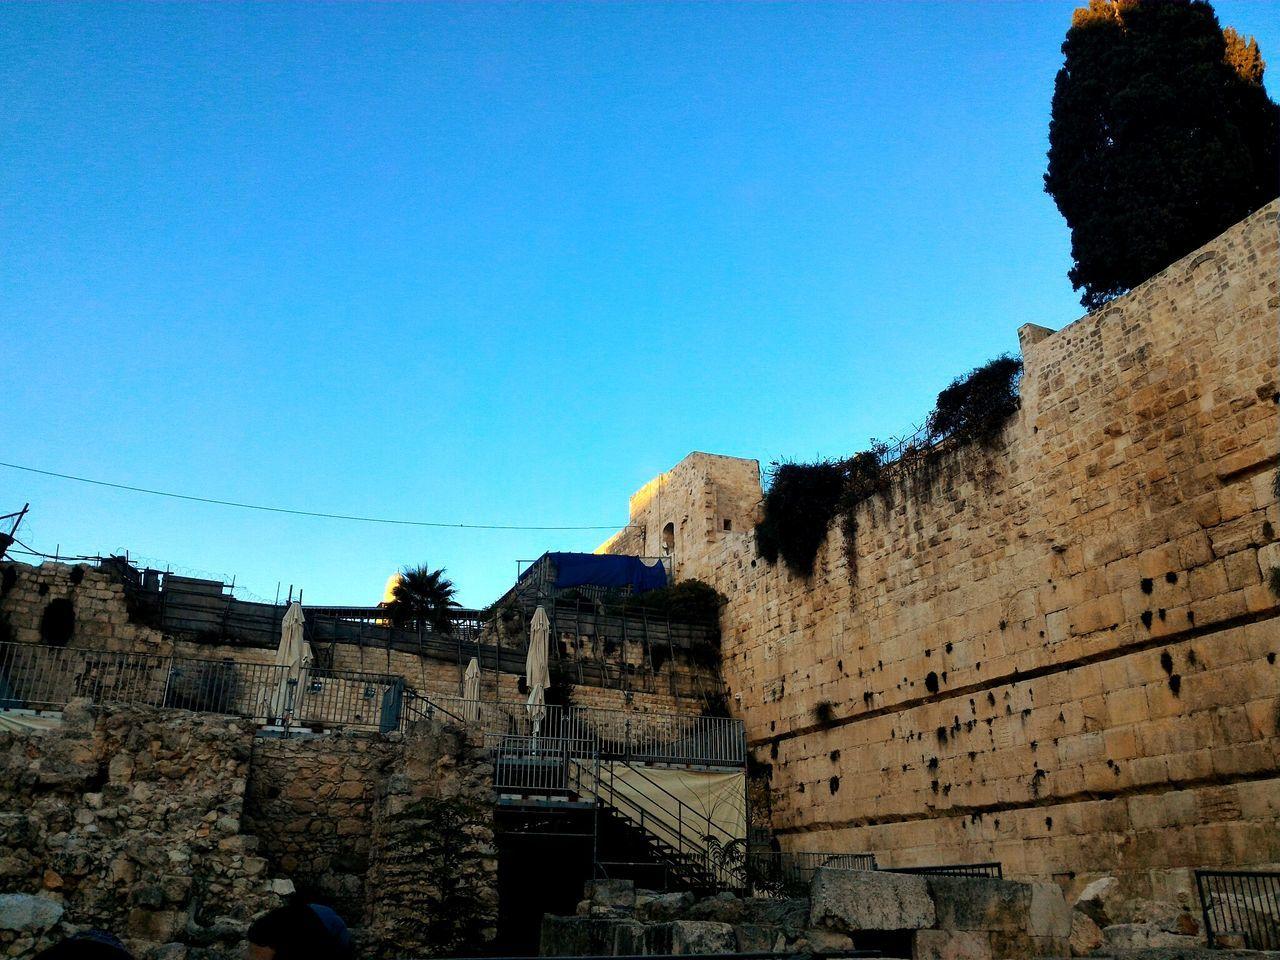 The Holy City in Old Jerusalem